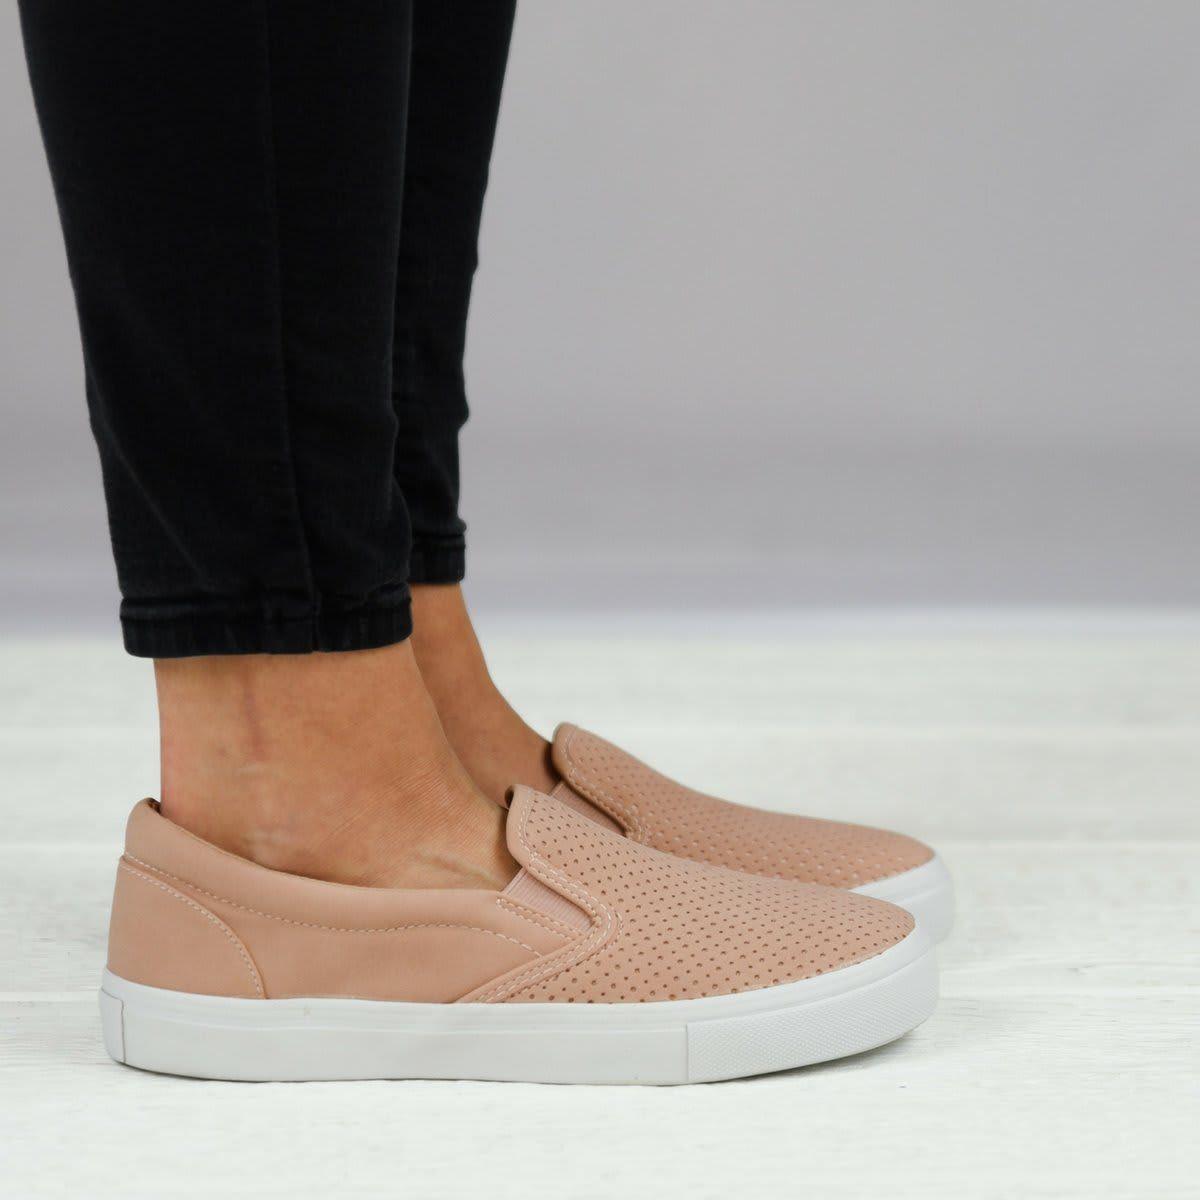 Cute Slip On Sneaker | 7 Colors | Slip